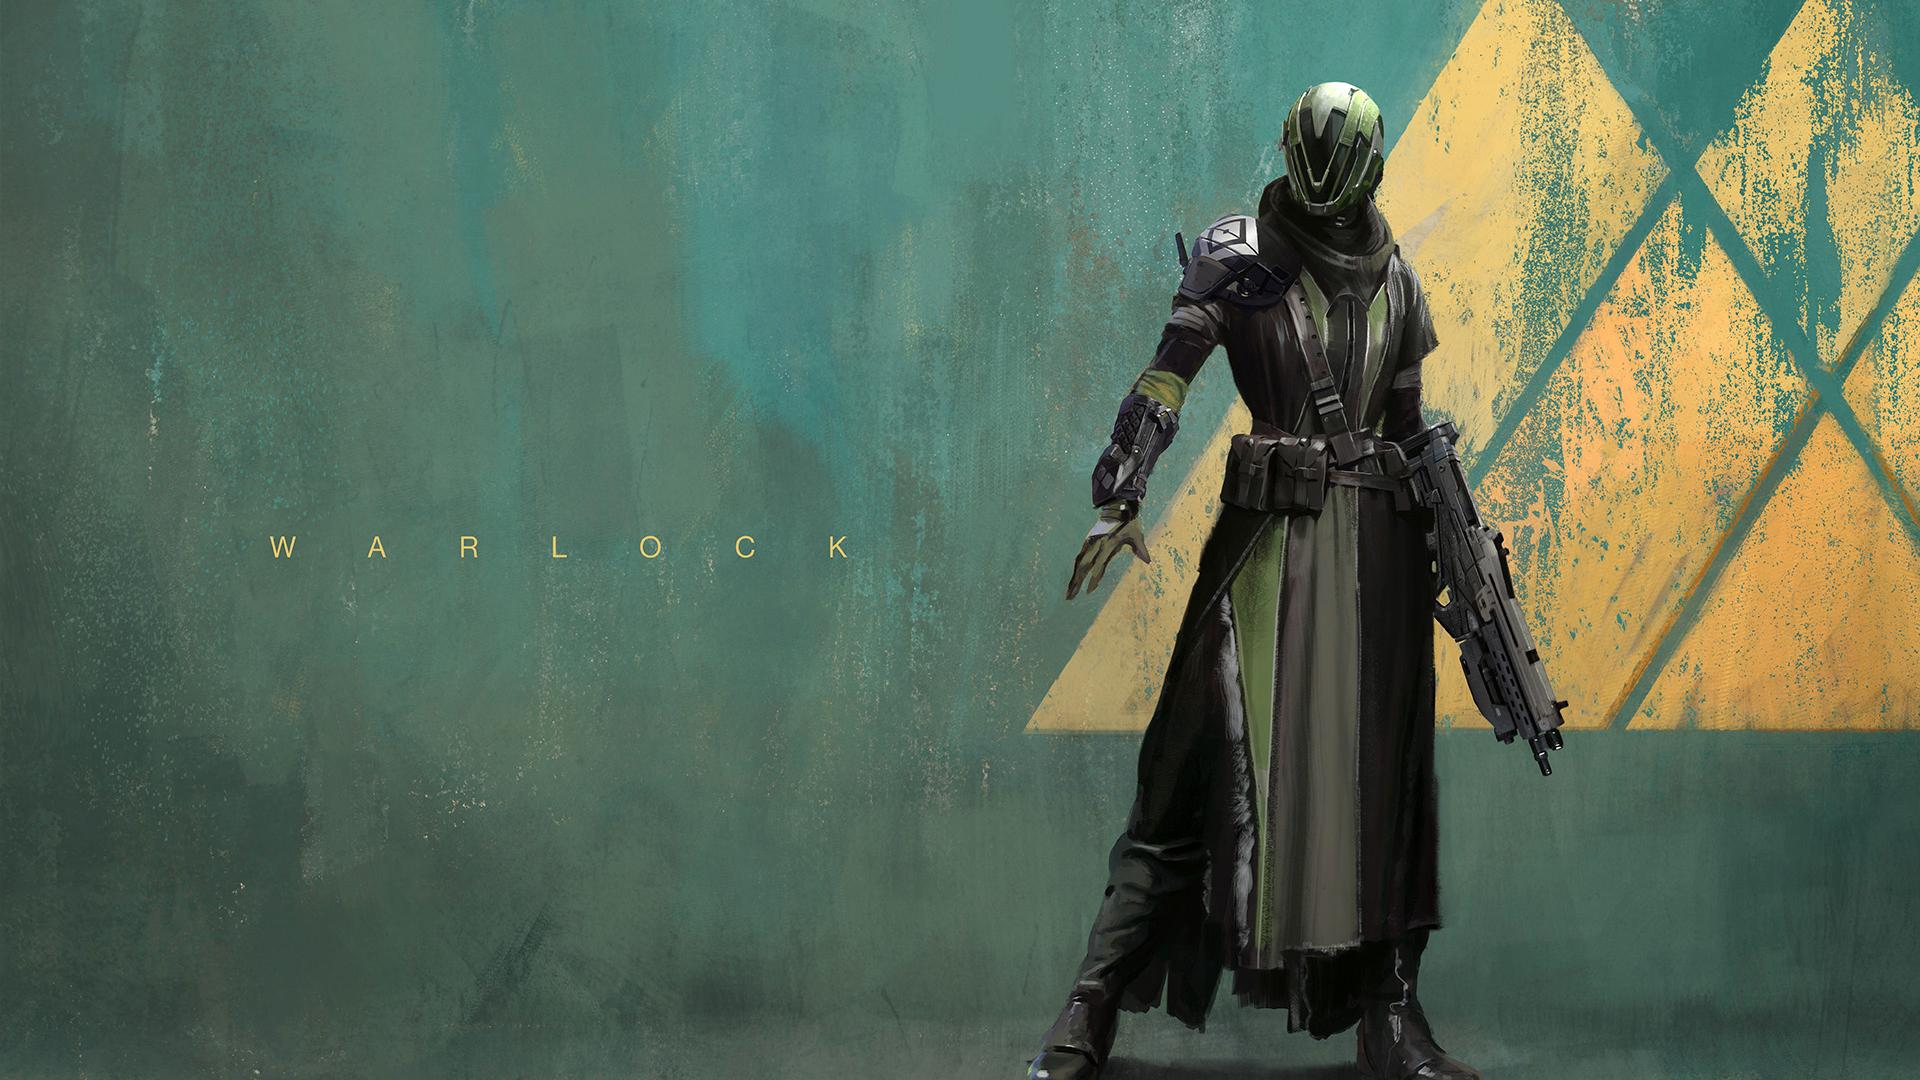 Warlock Destiny Game Guardian Class Character Hd 1920x1080 ...